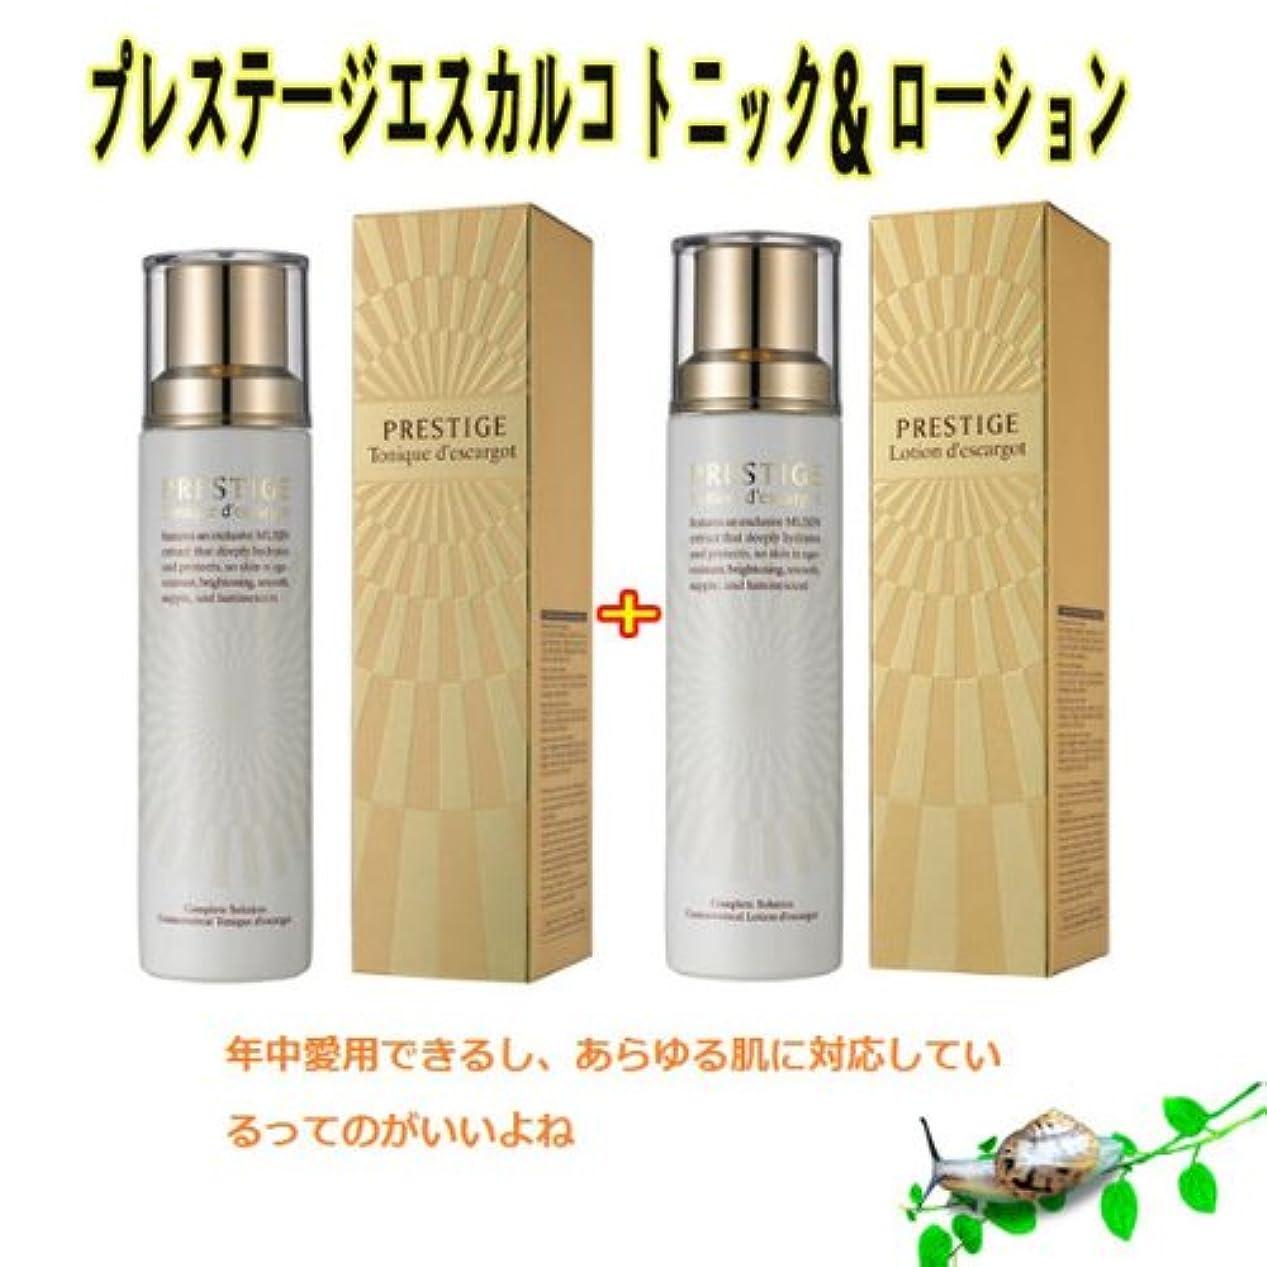 It's skin イッツスキン プレステージ エスカルゴ【化粧水+乳液】セット